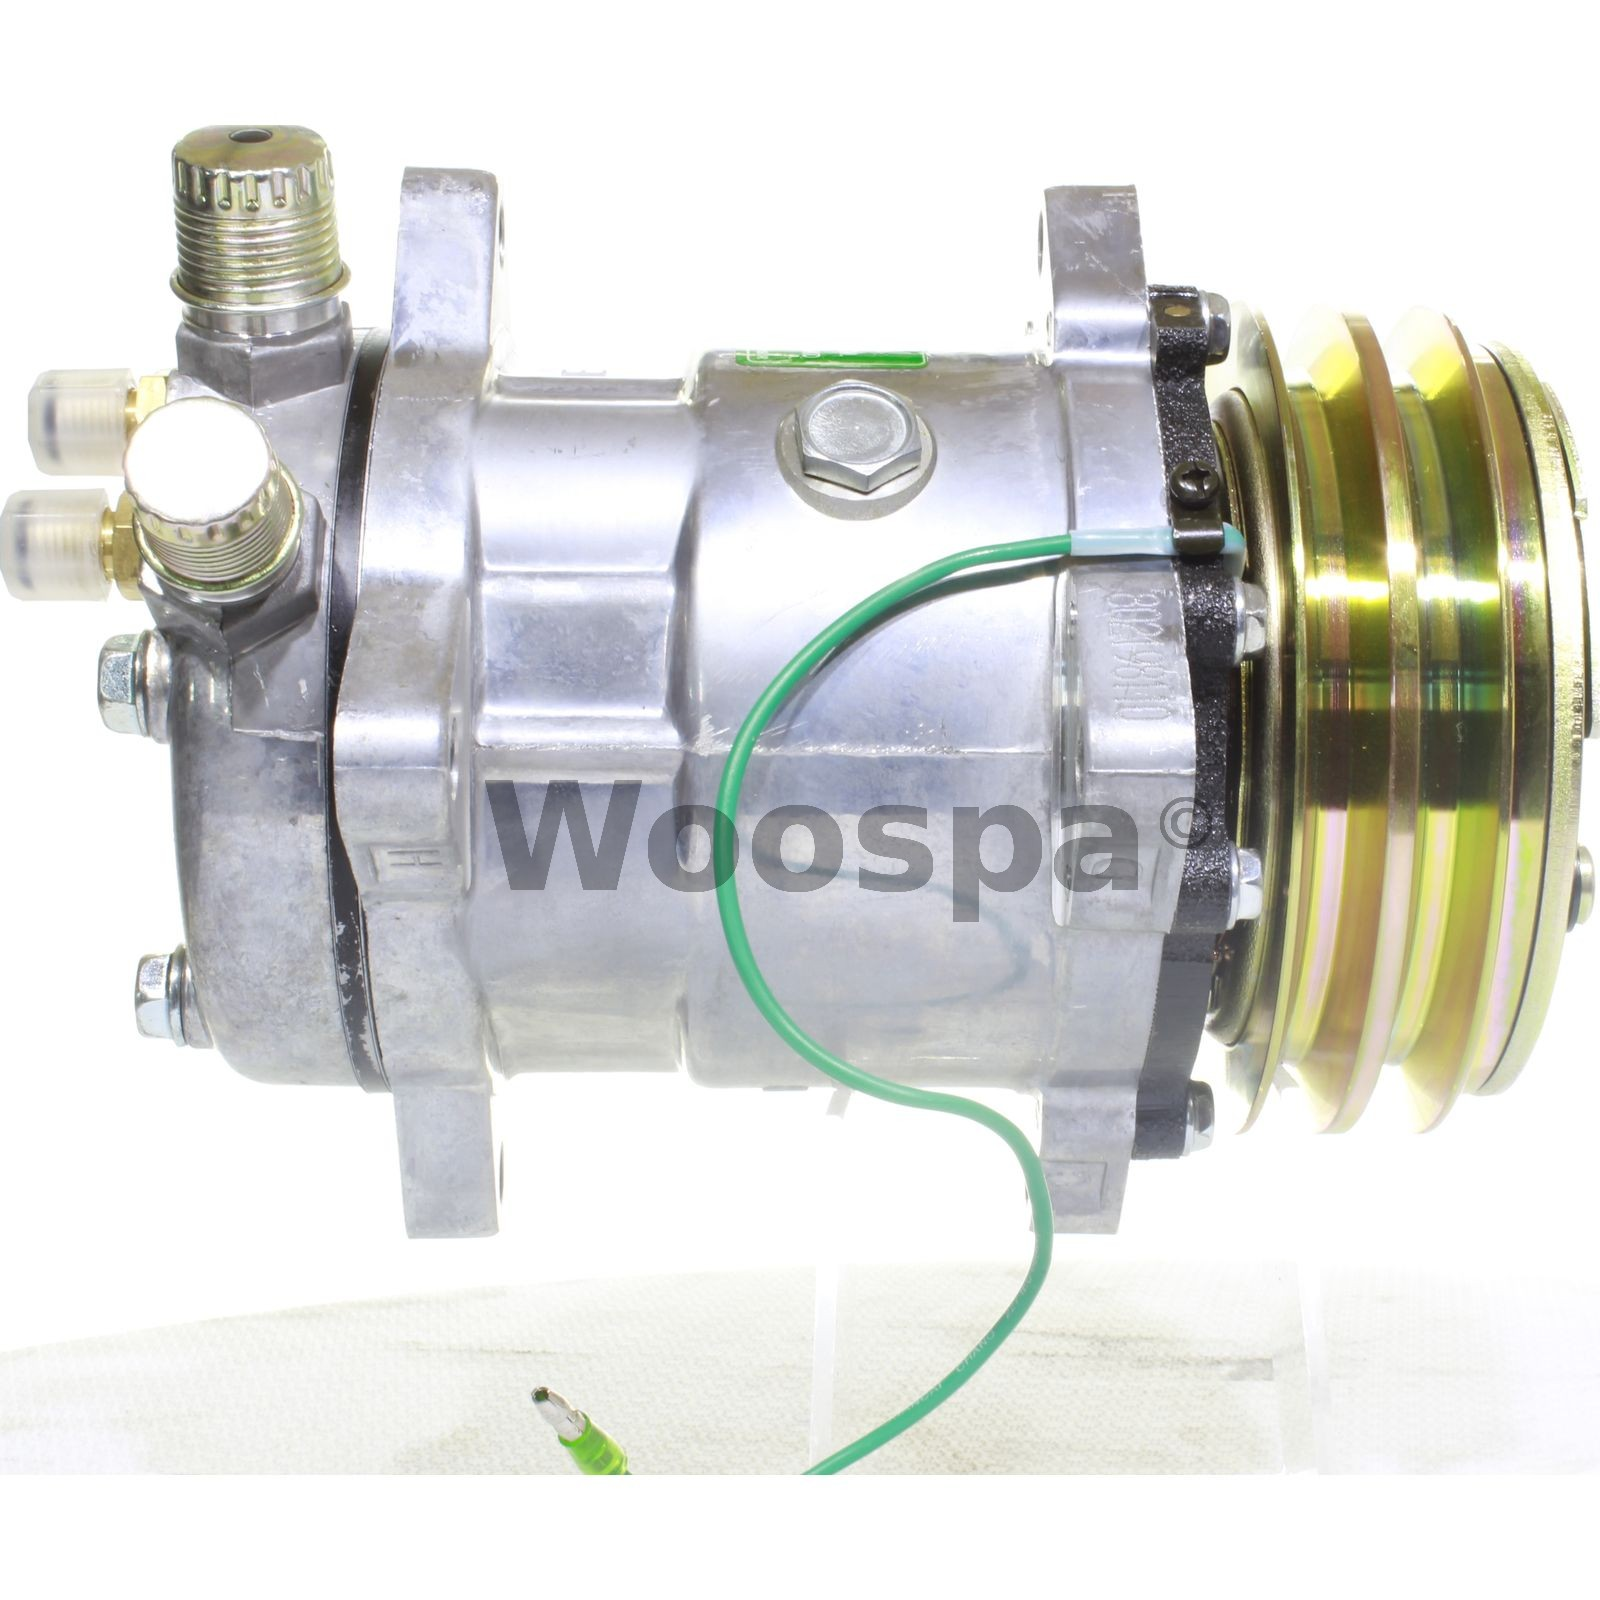 Klimakompressor 24V Universal Sd508 Isuzu Faun Frutiger Furukawa Vertical Clare